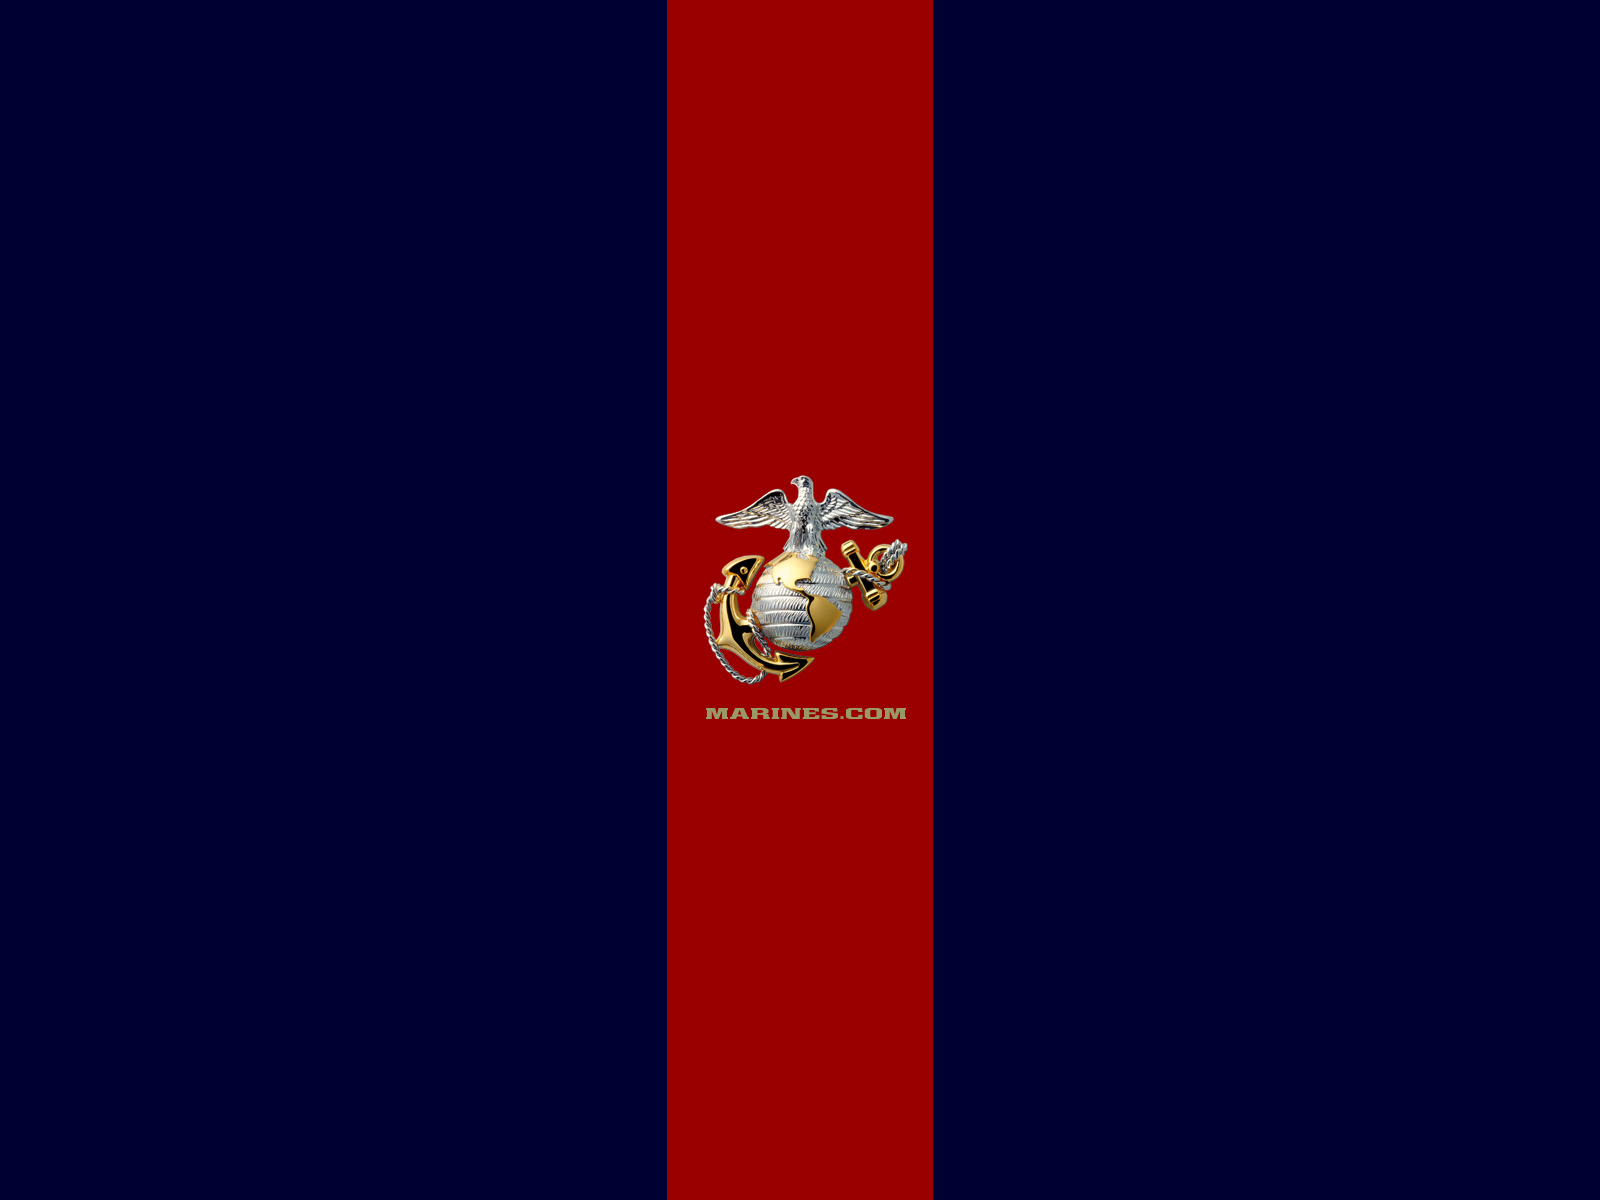 marine corps logo wallpaper - photo #25